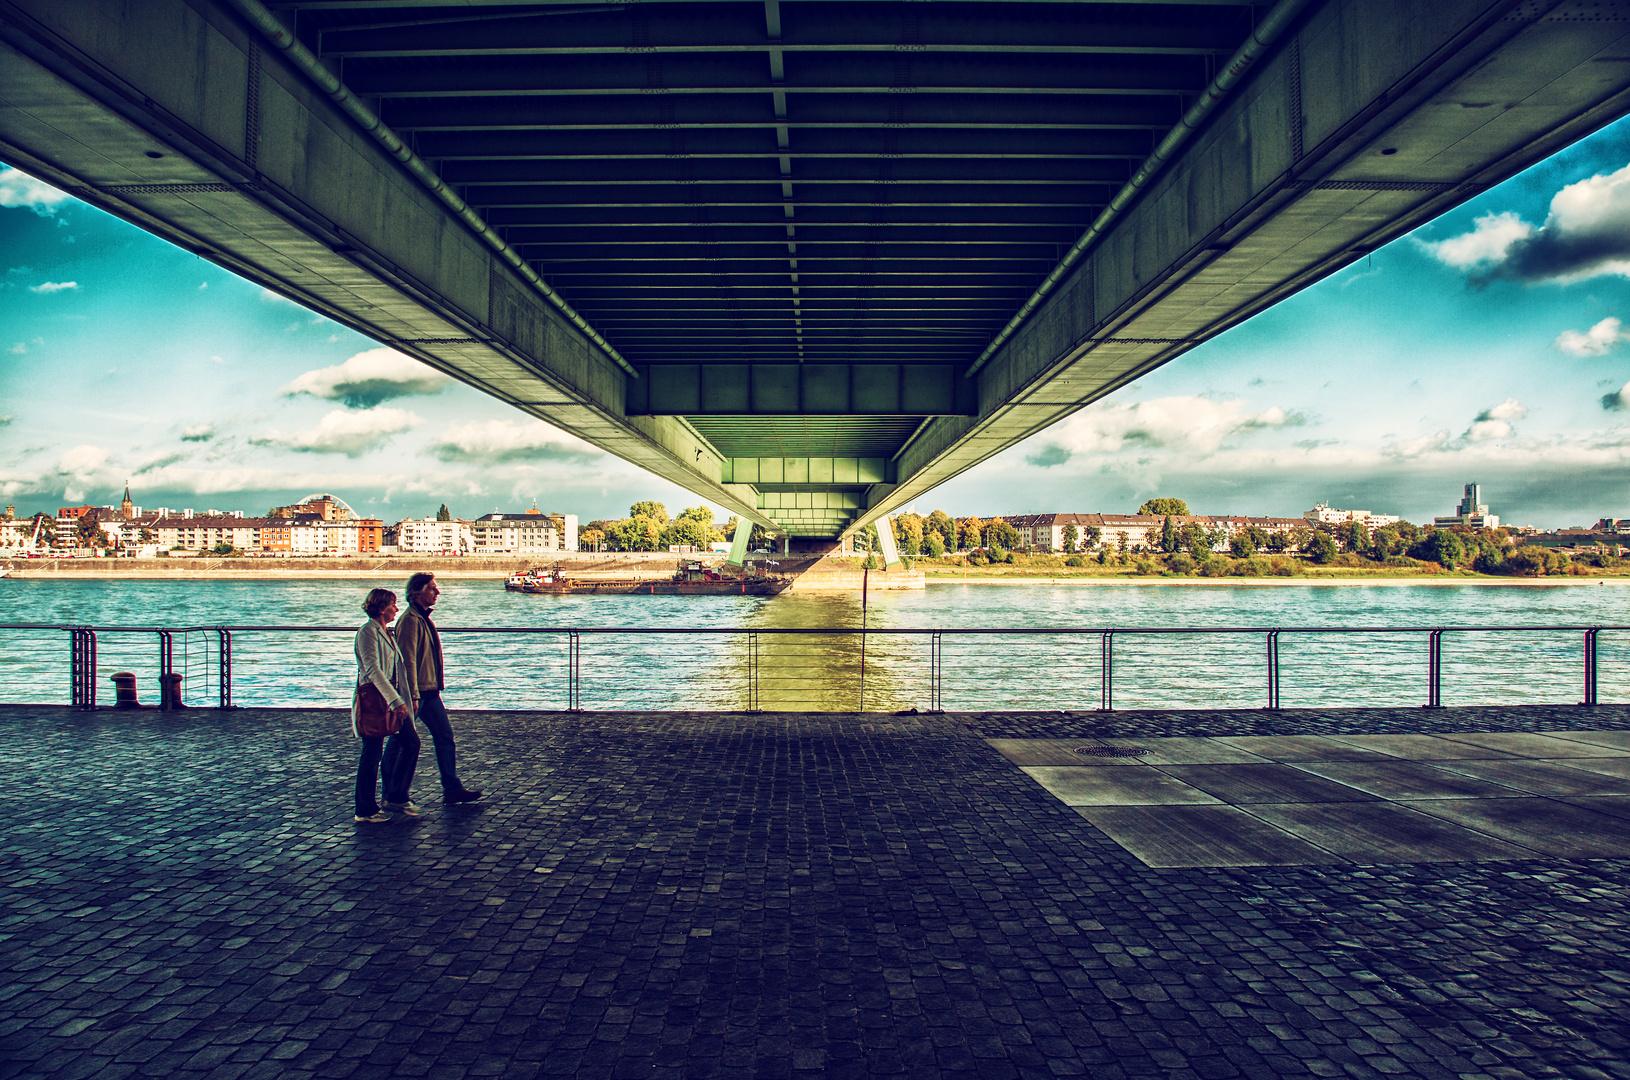 * Under the Bridge *